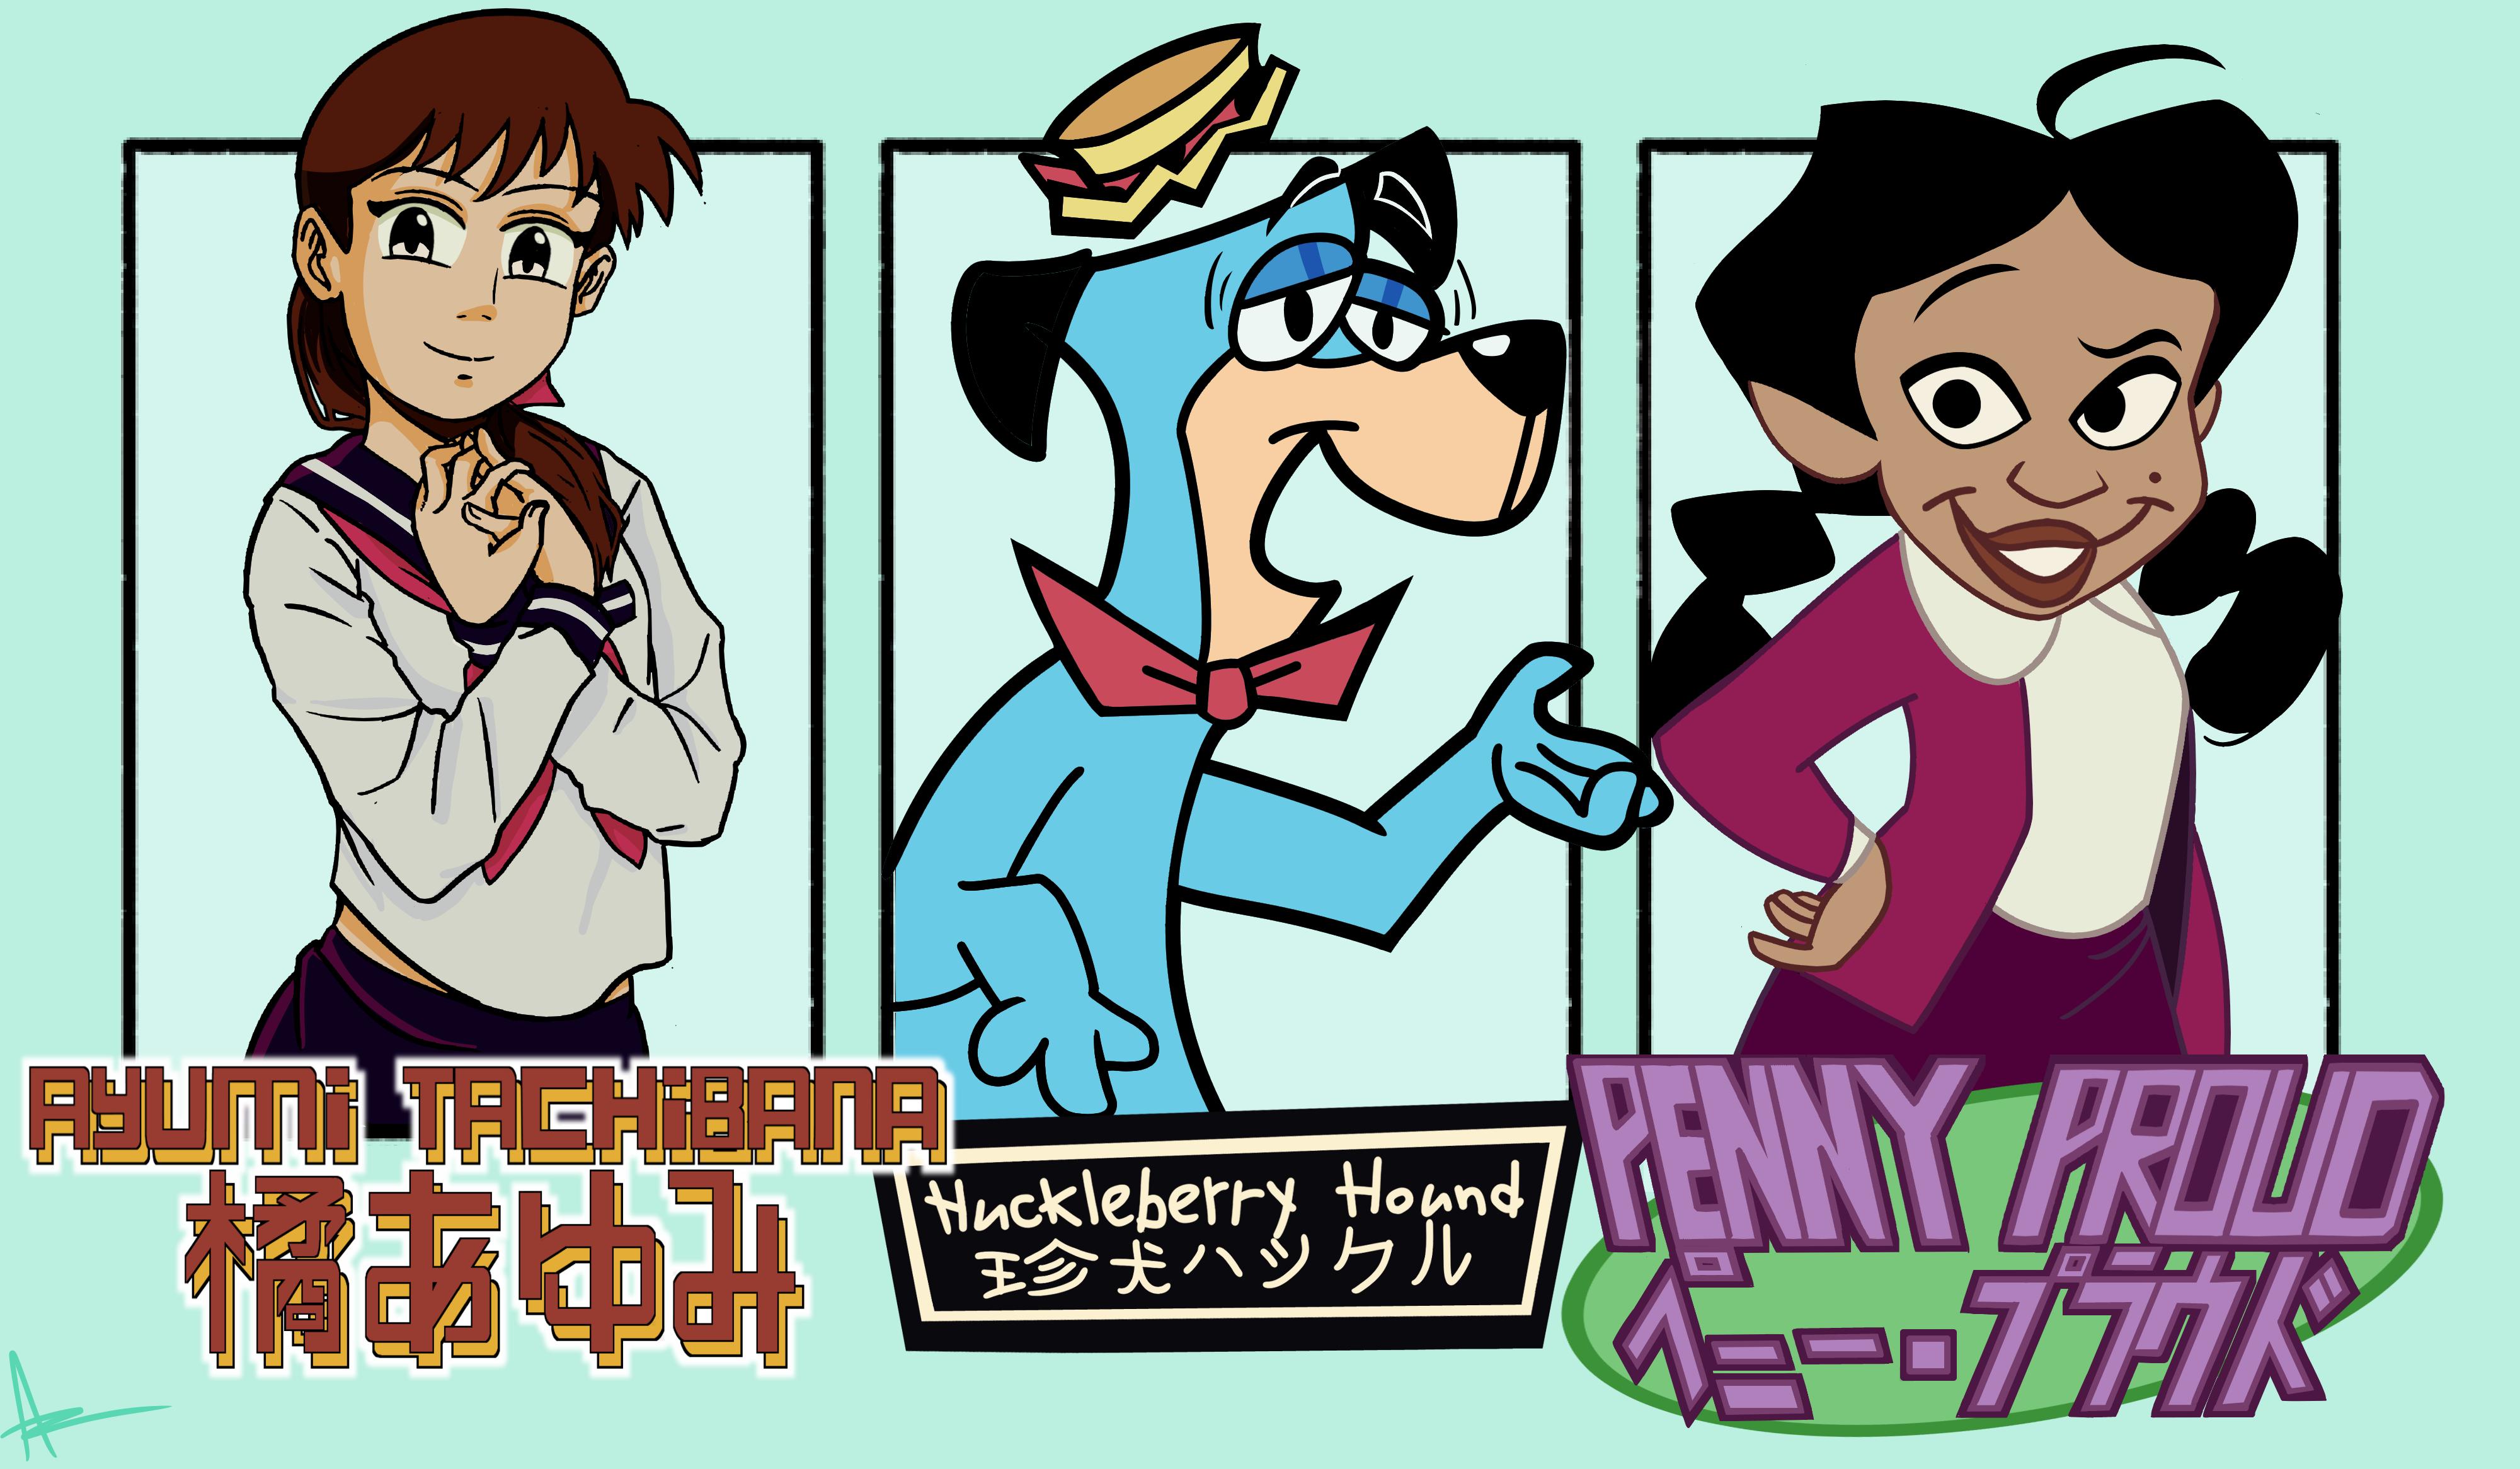 More Character Drawings